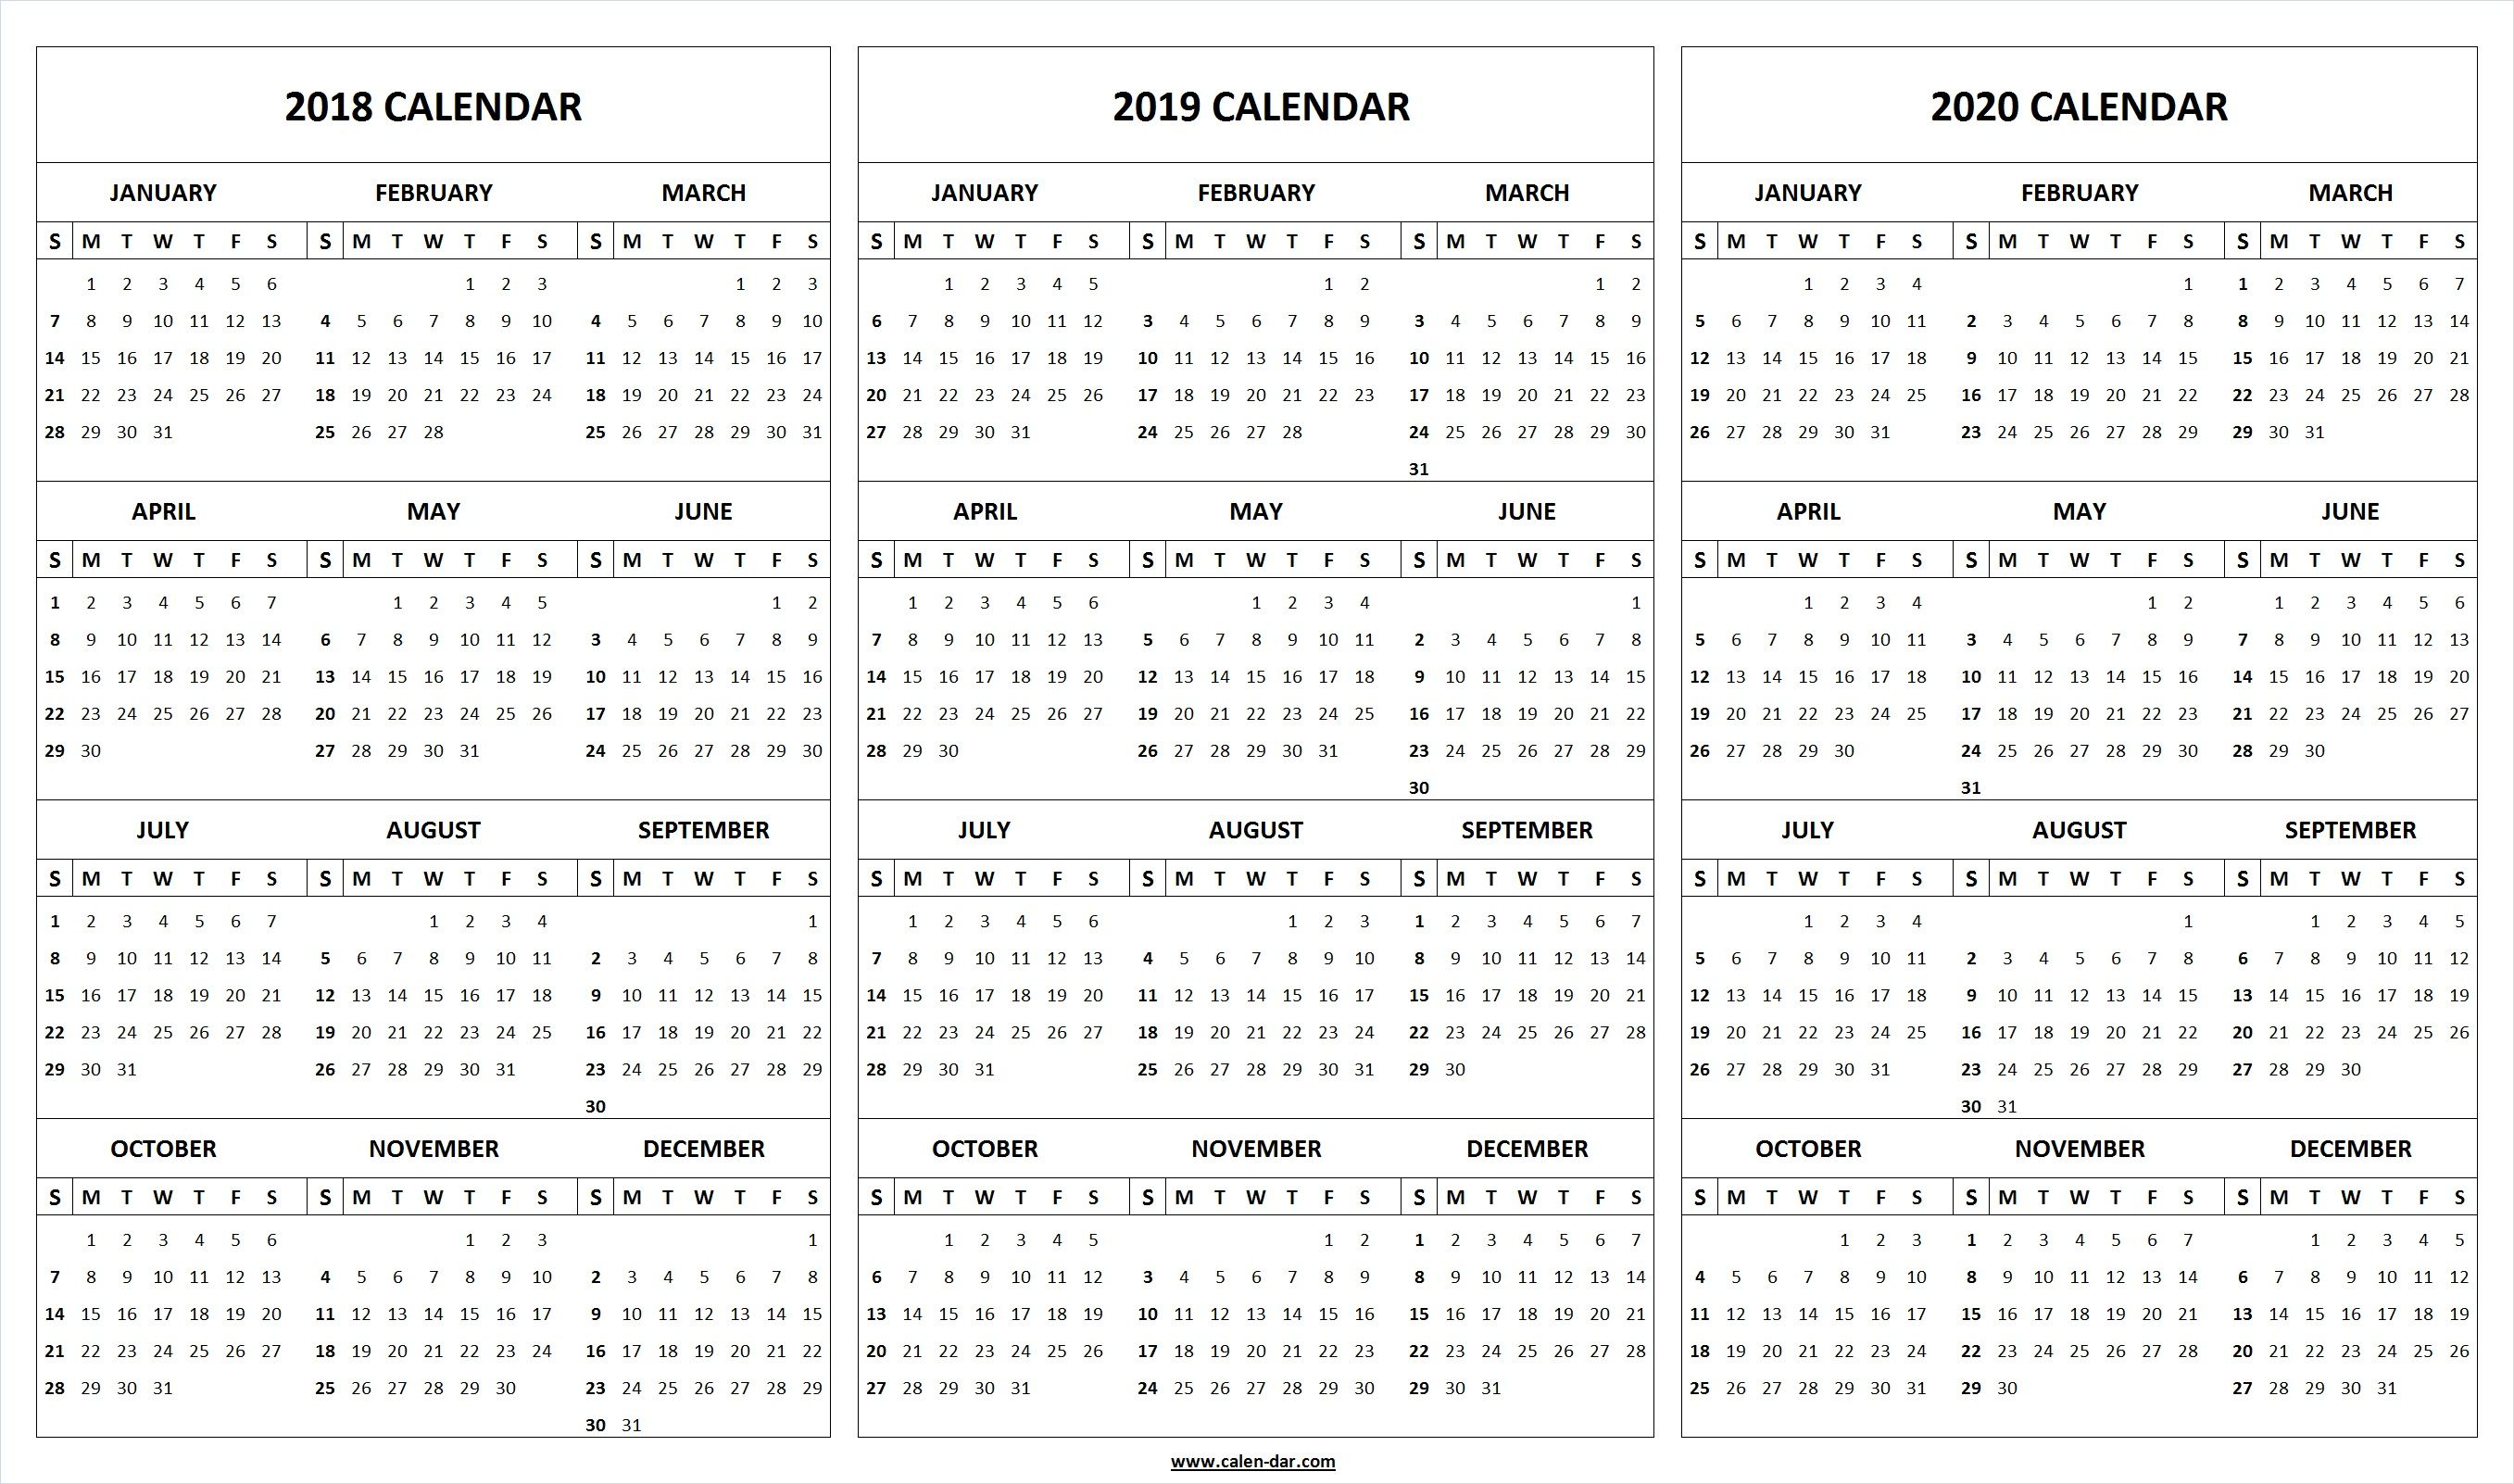 Print Blank 2018 2019 2020 Calendar Template   Organize